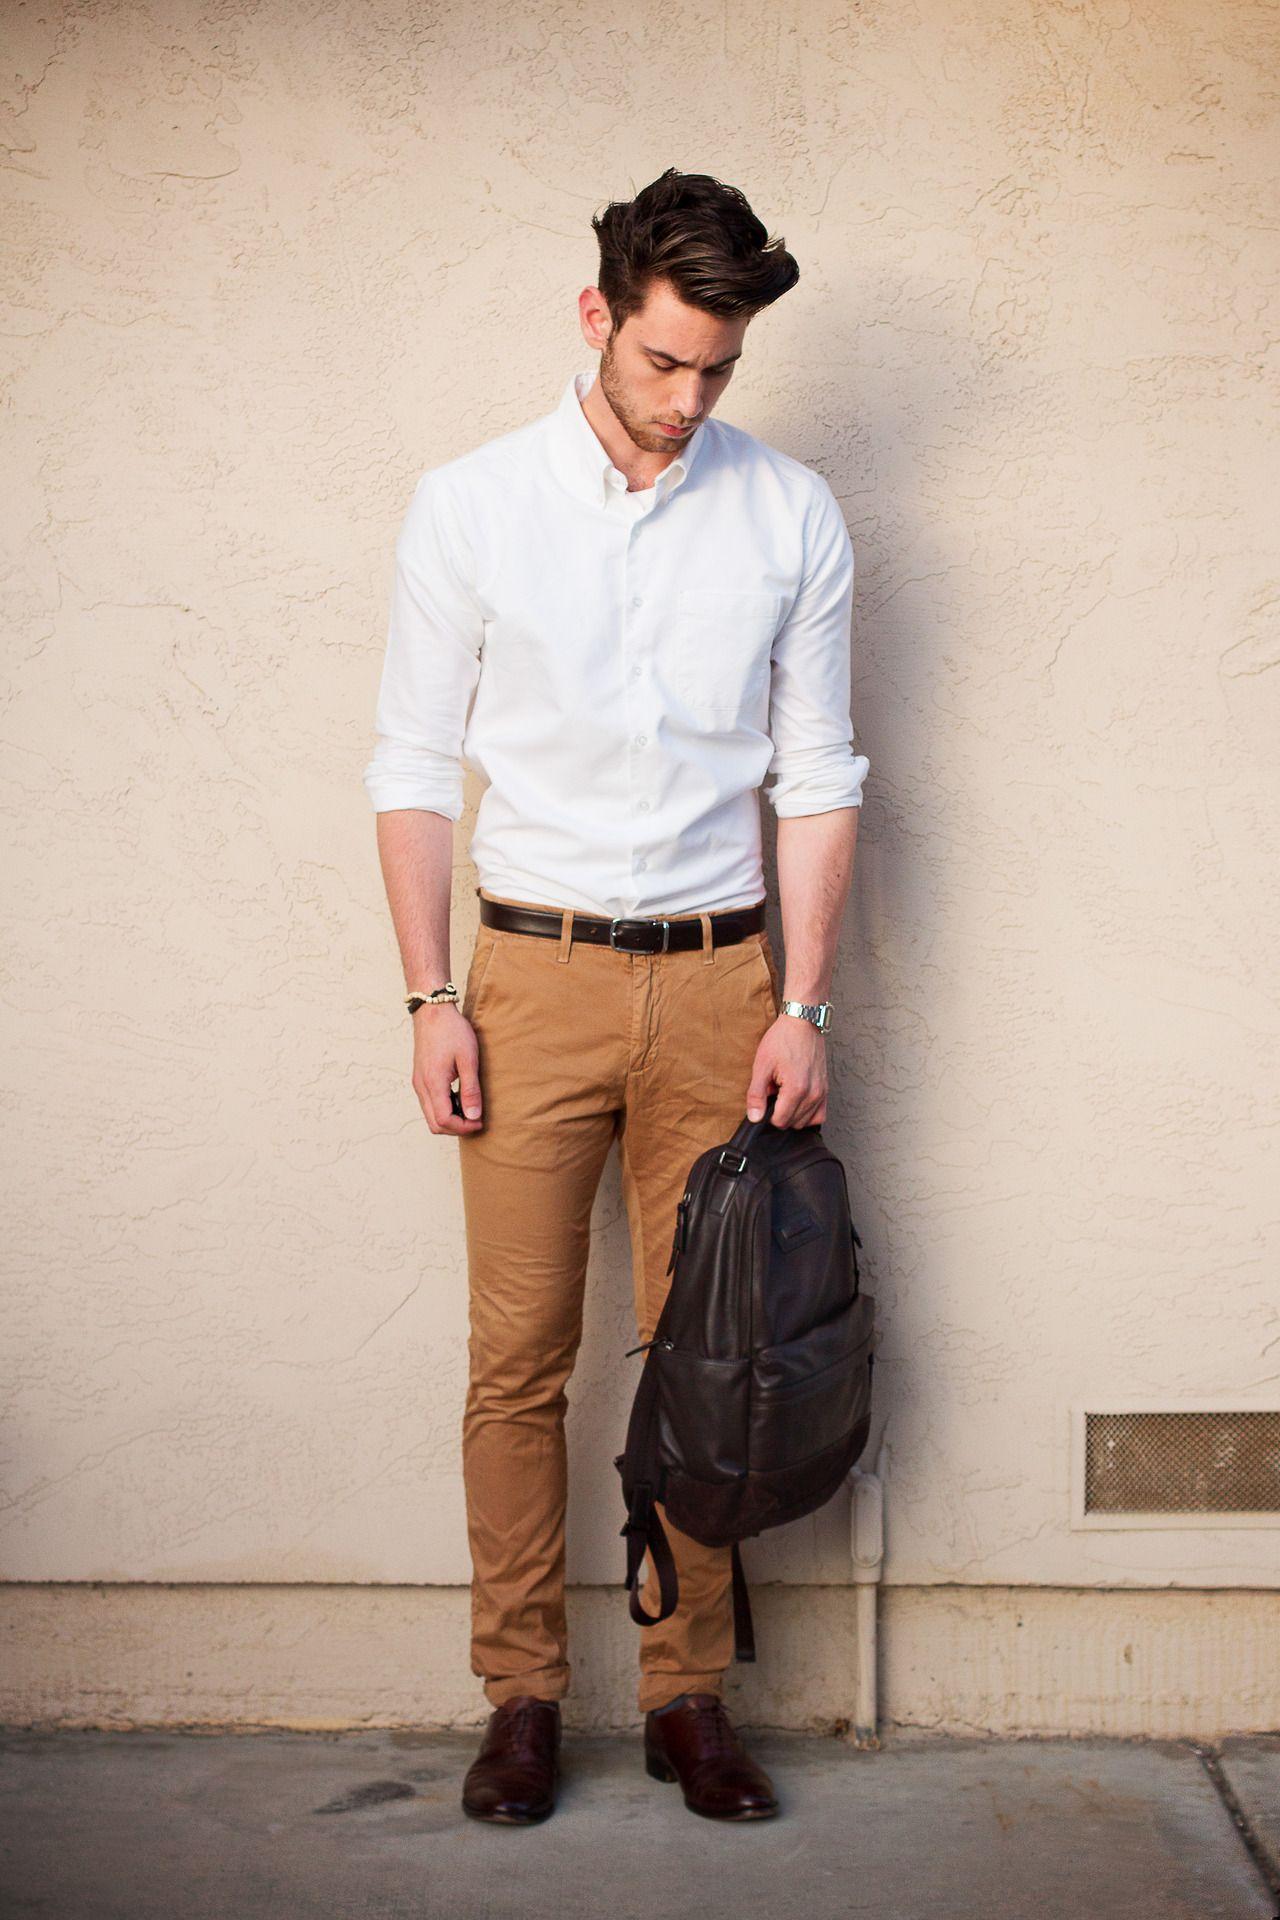 Men's Fashion   Apparel   Backpack   Style   Men's Apparel ...